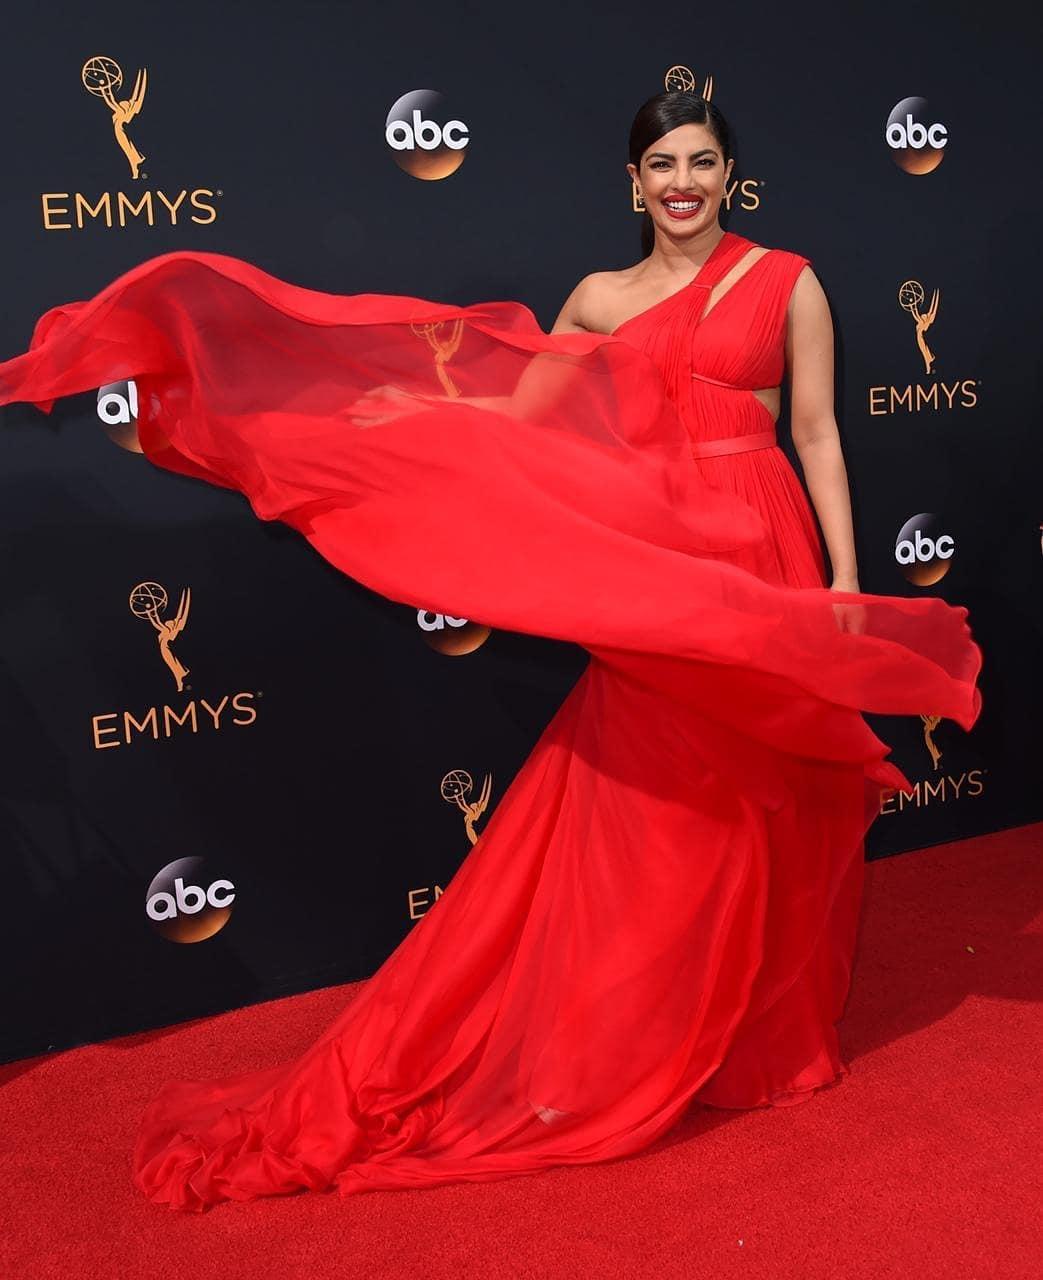 Priyanka Chopra in red dress HD images